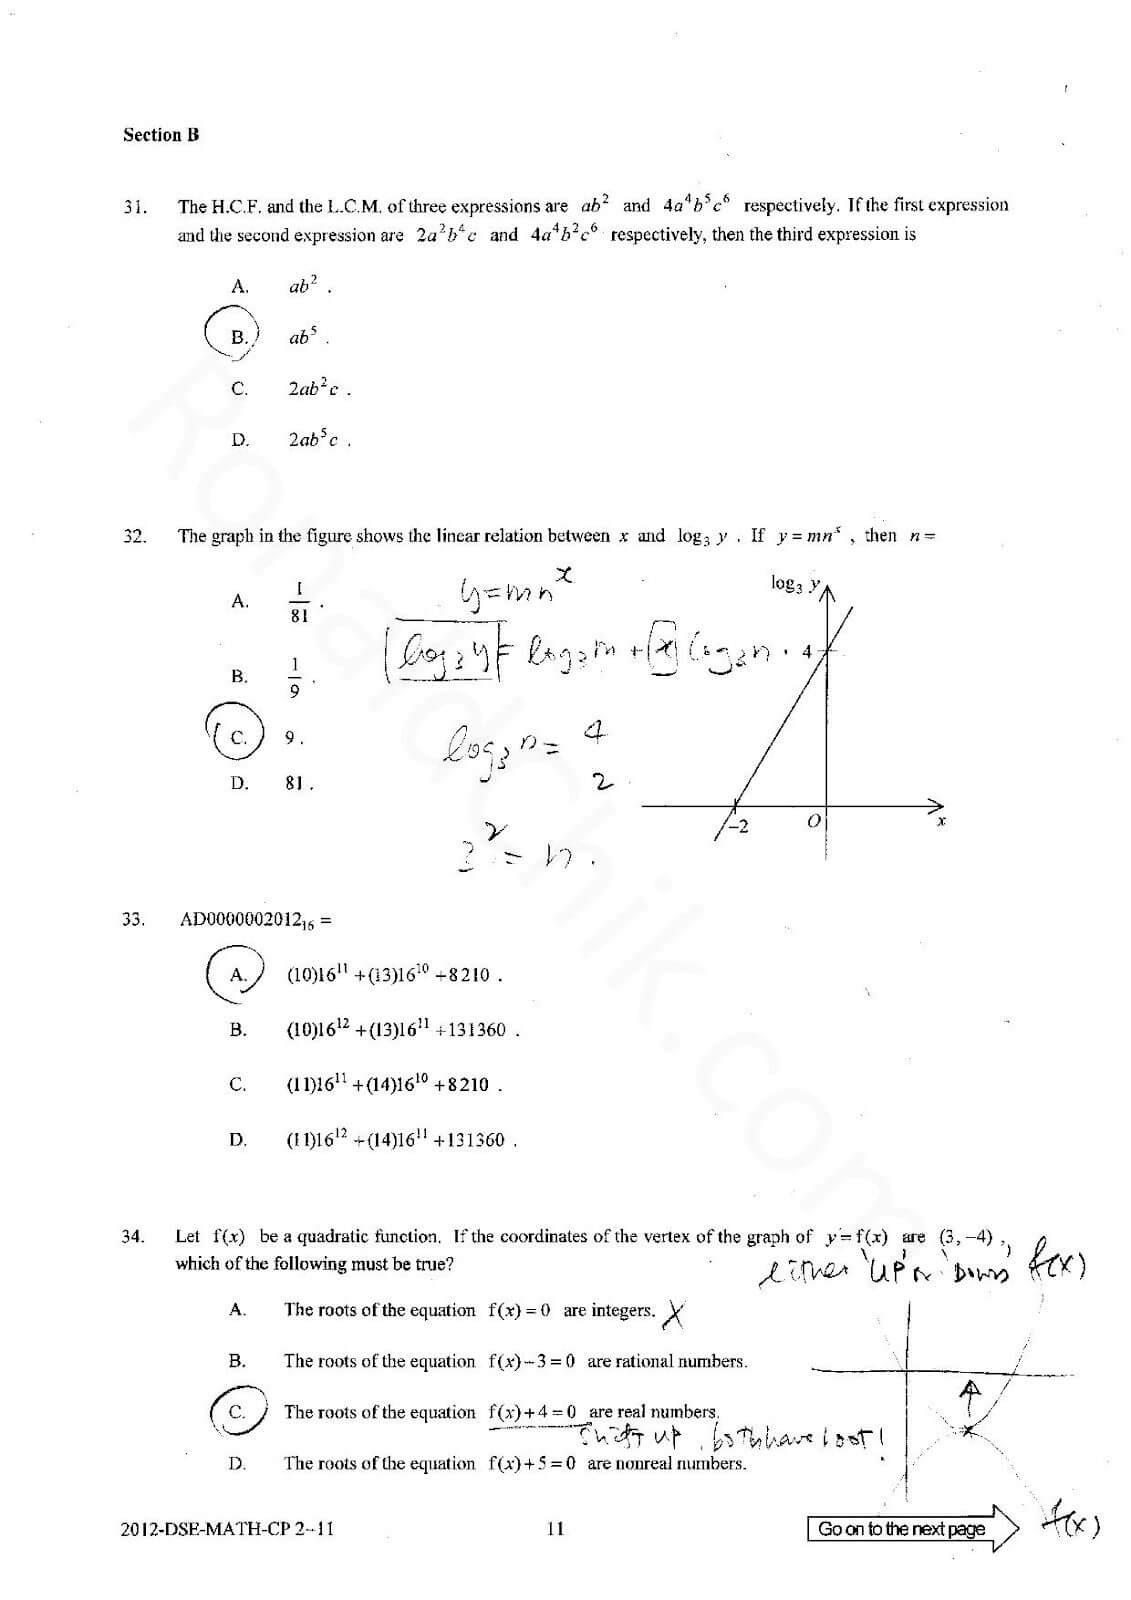 2012 DSE Math P2 卷二 Q31,32,33,34